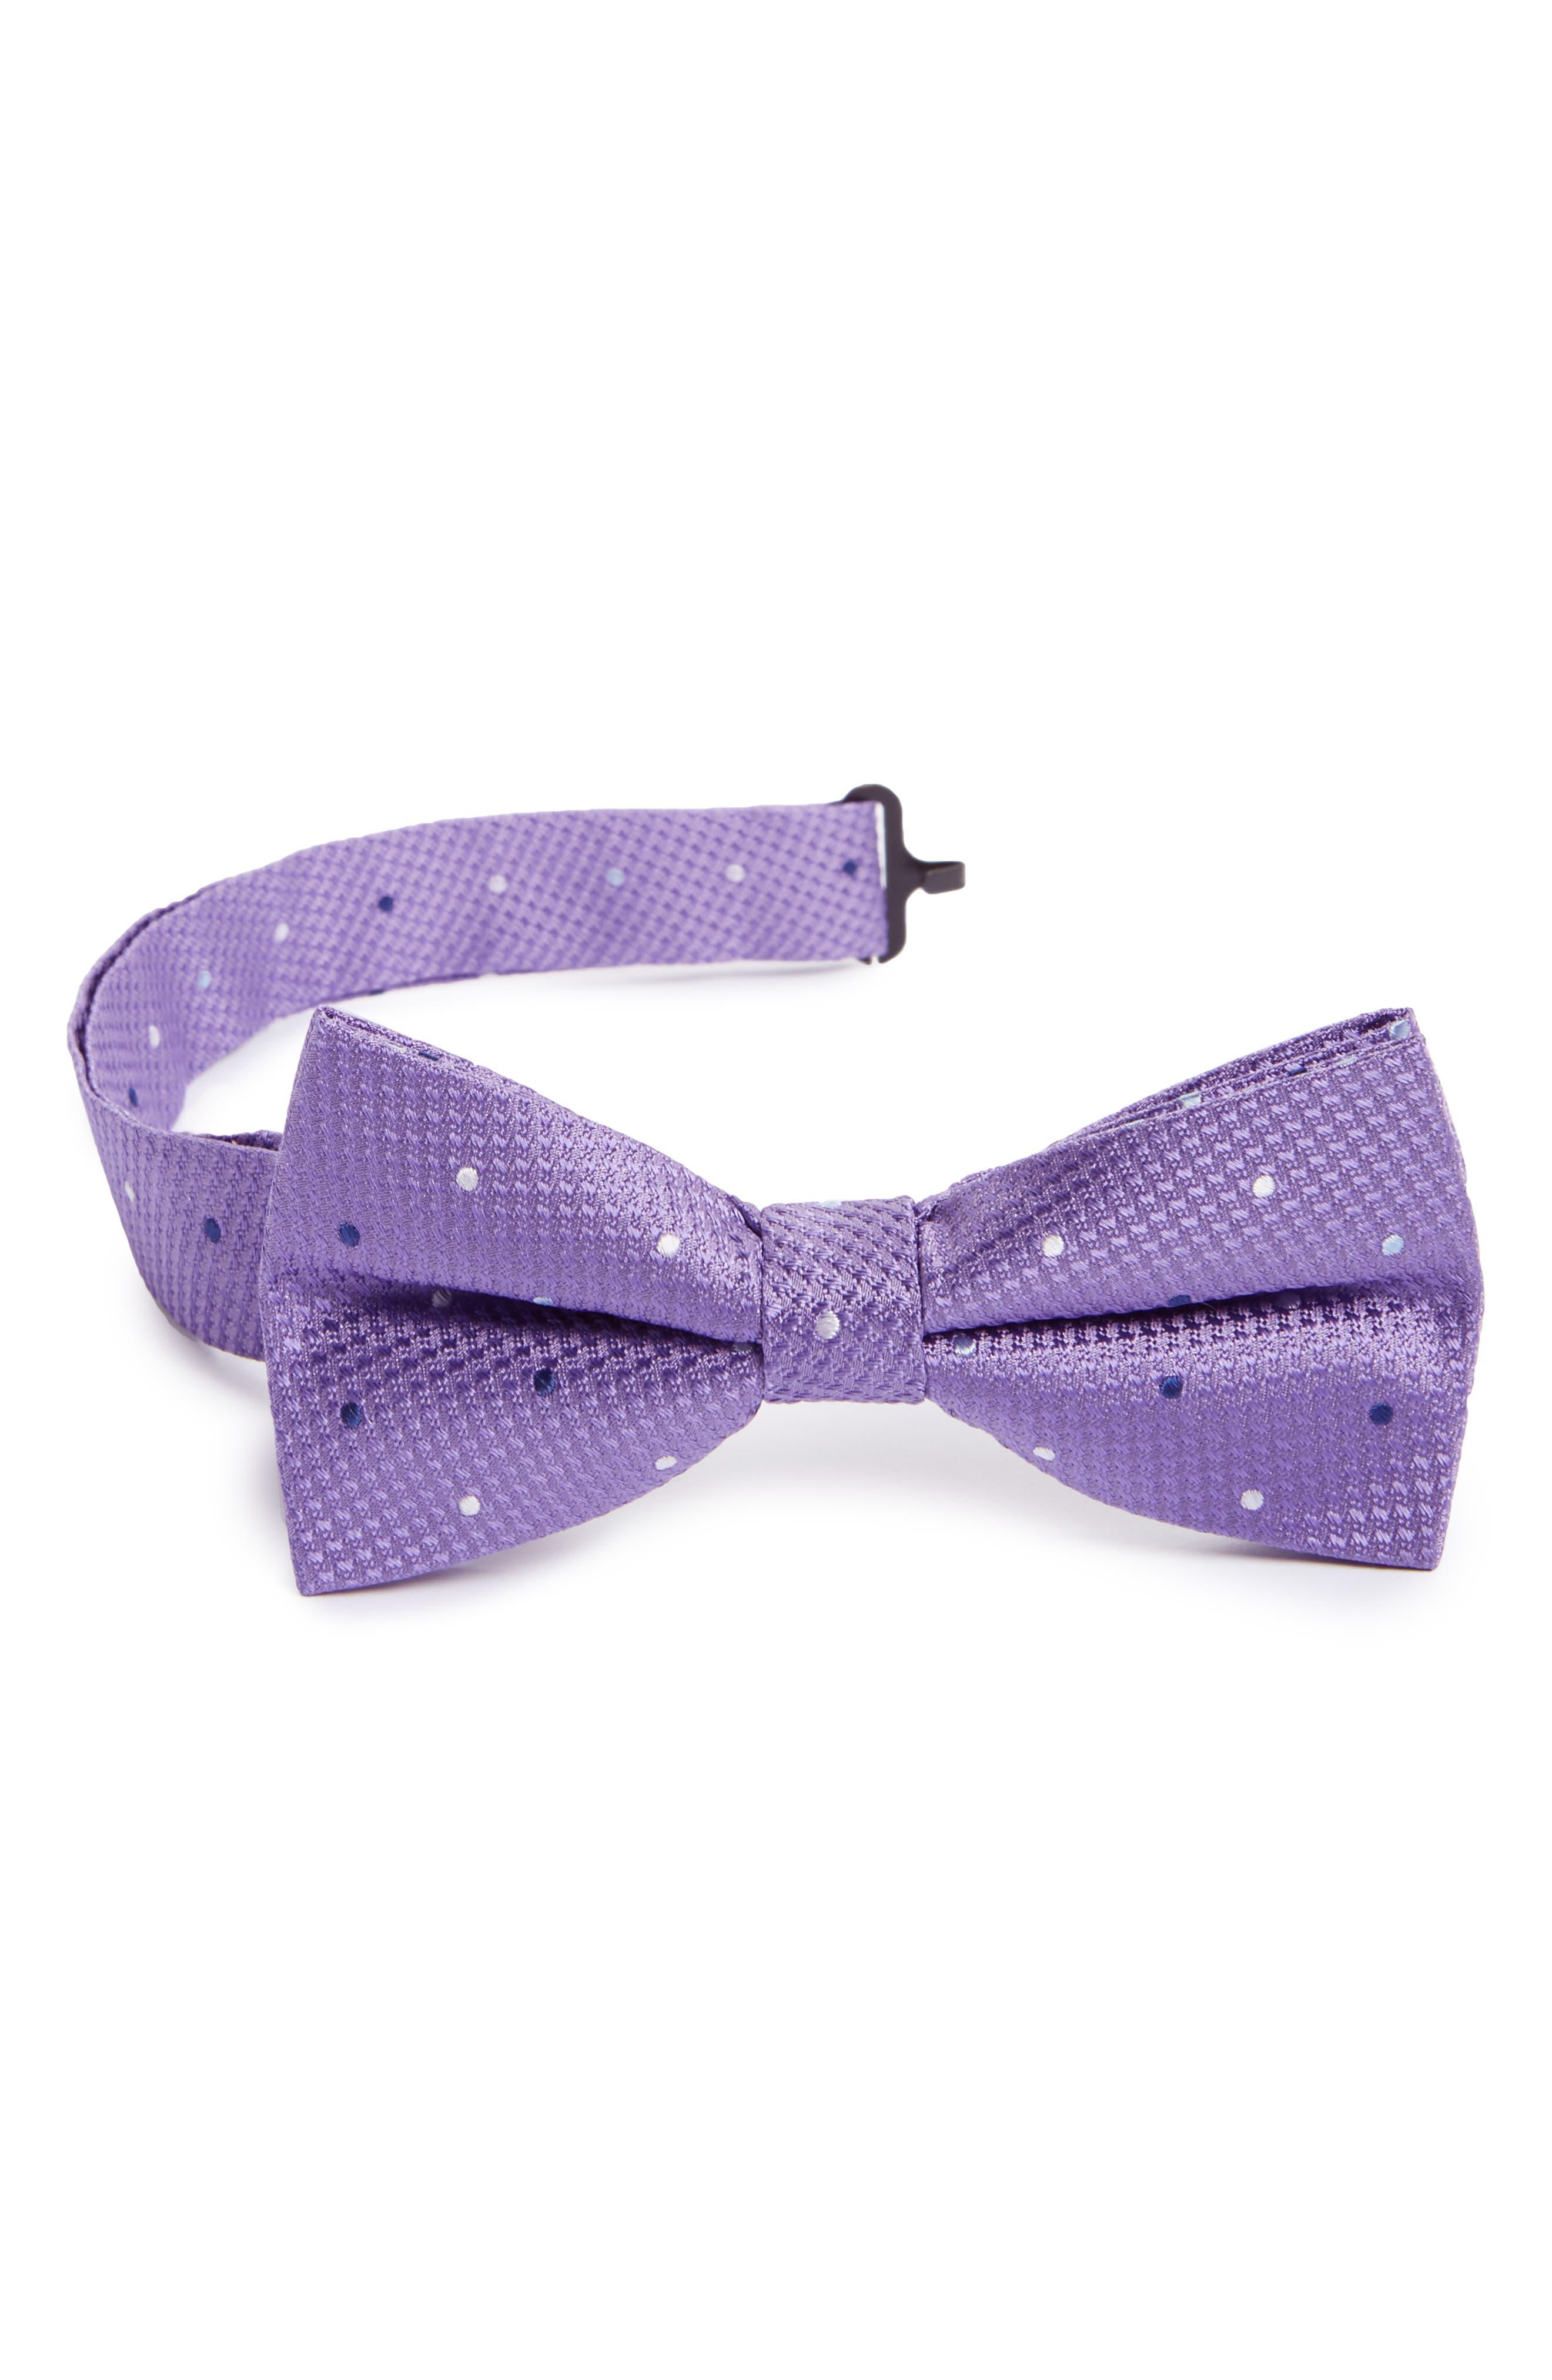 Alternate Image 1 Selected - Nordstrom Dot Silk Bow Tie (Big Boys)